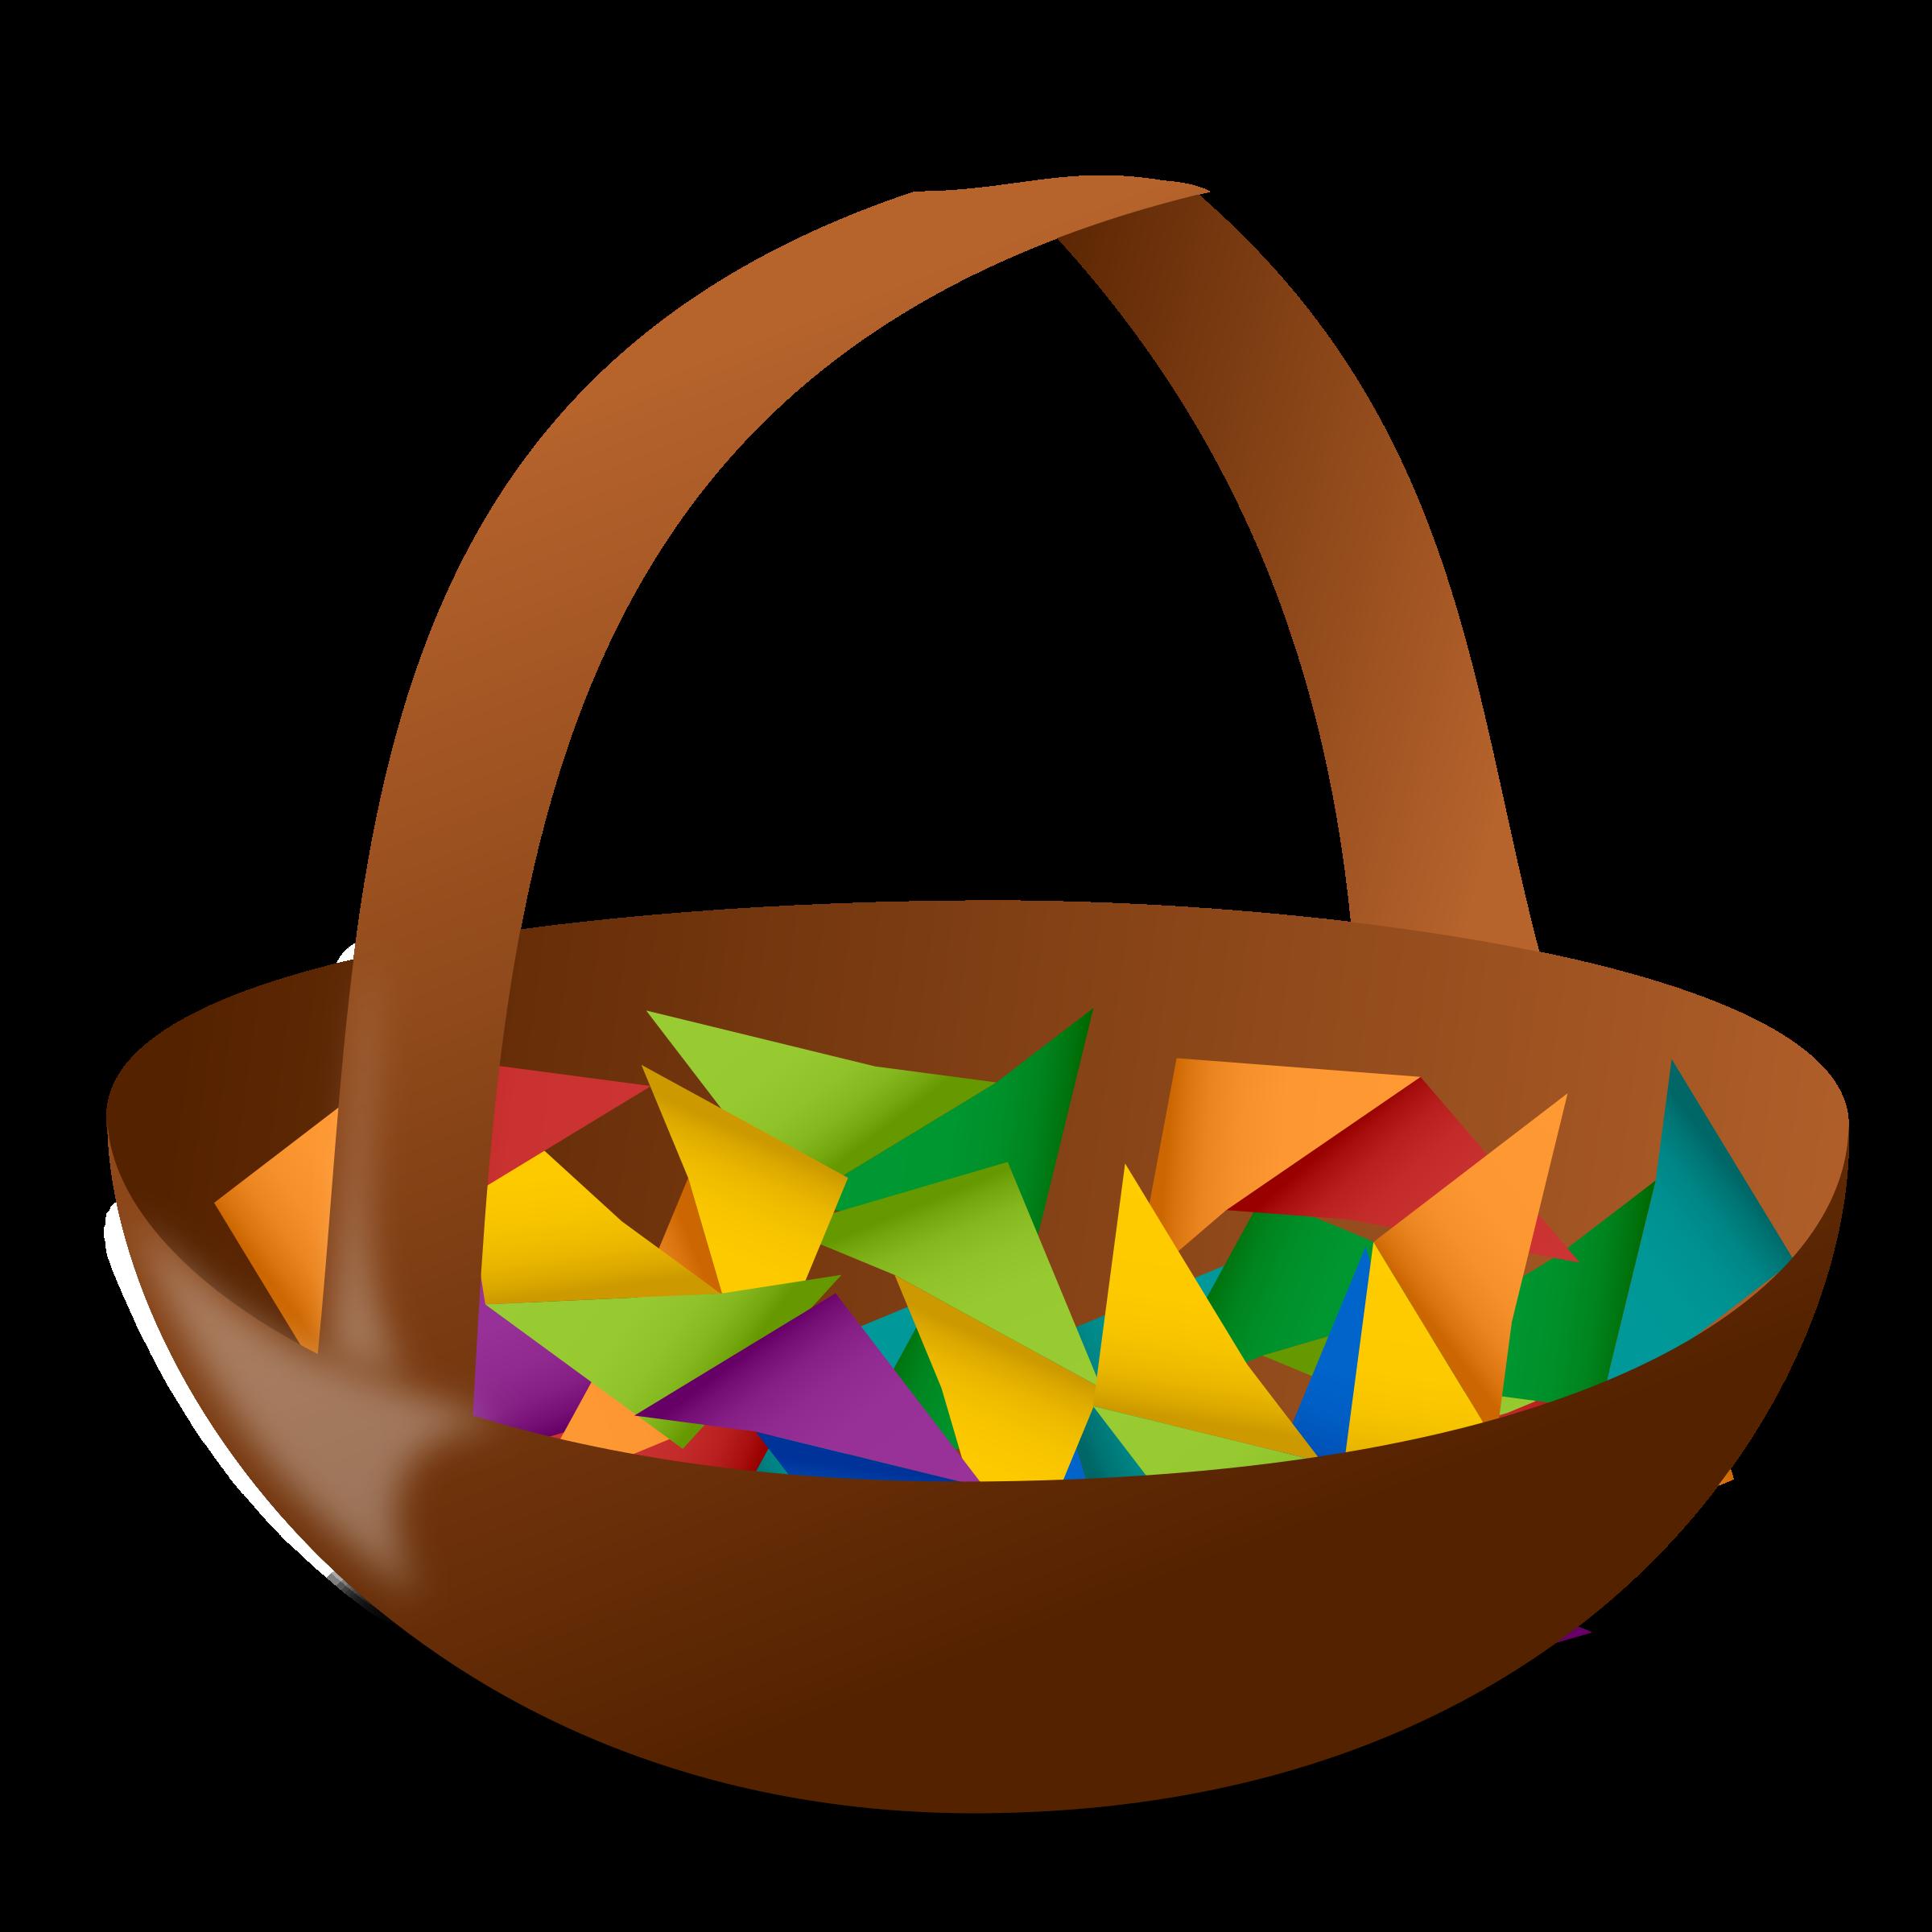 jpg free stock Basket big image png. Raffle clipart.